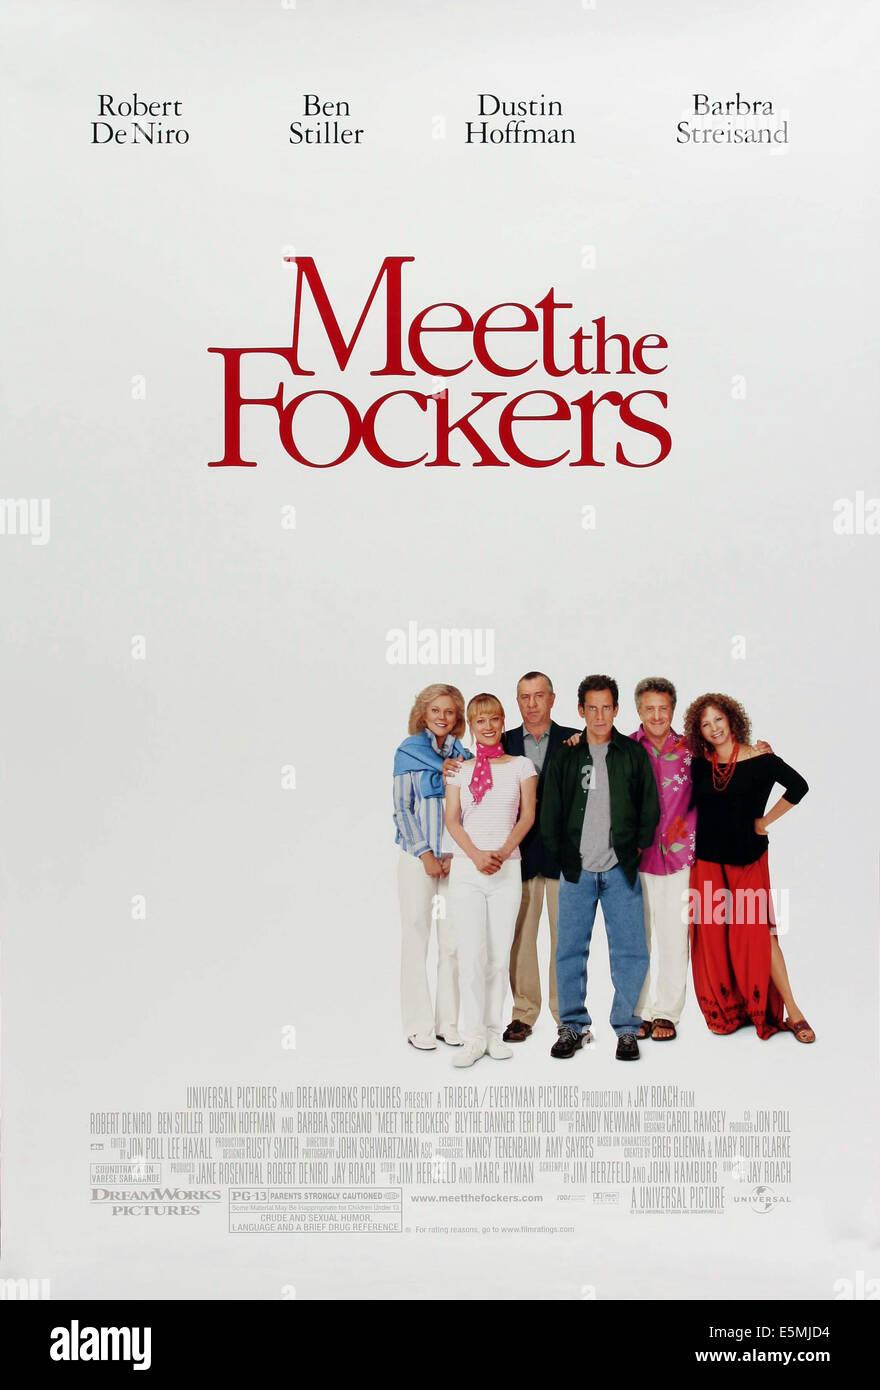 MEET THE FOCKERS, Blythe Danner, Teri Polo, Robert De Niro, Ben Stiller, Dustin Hoffman, Barbra Streisand, 2004, - Stock Image